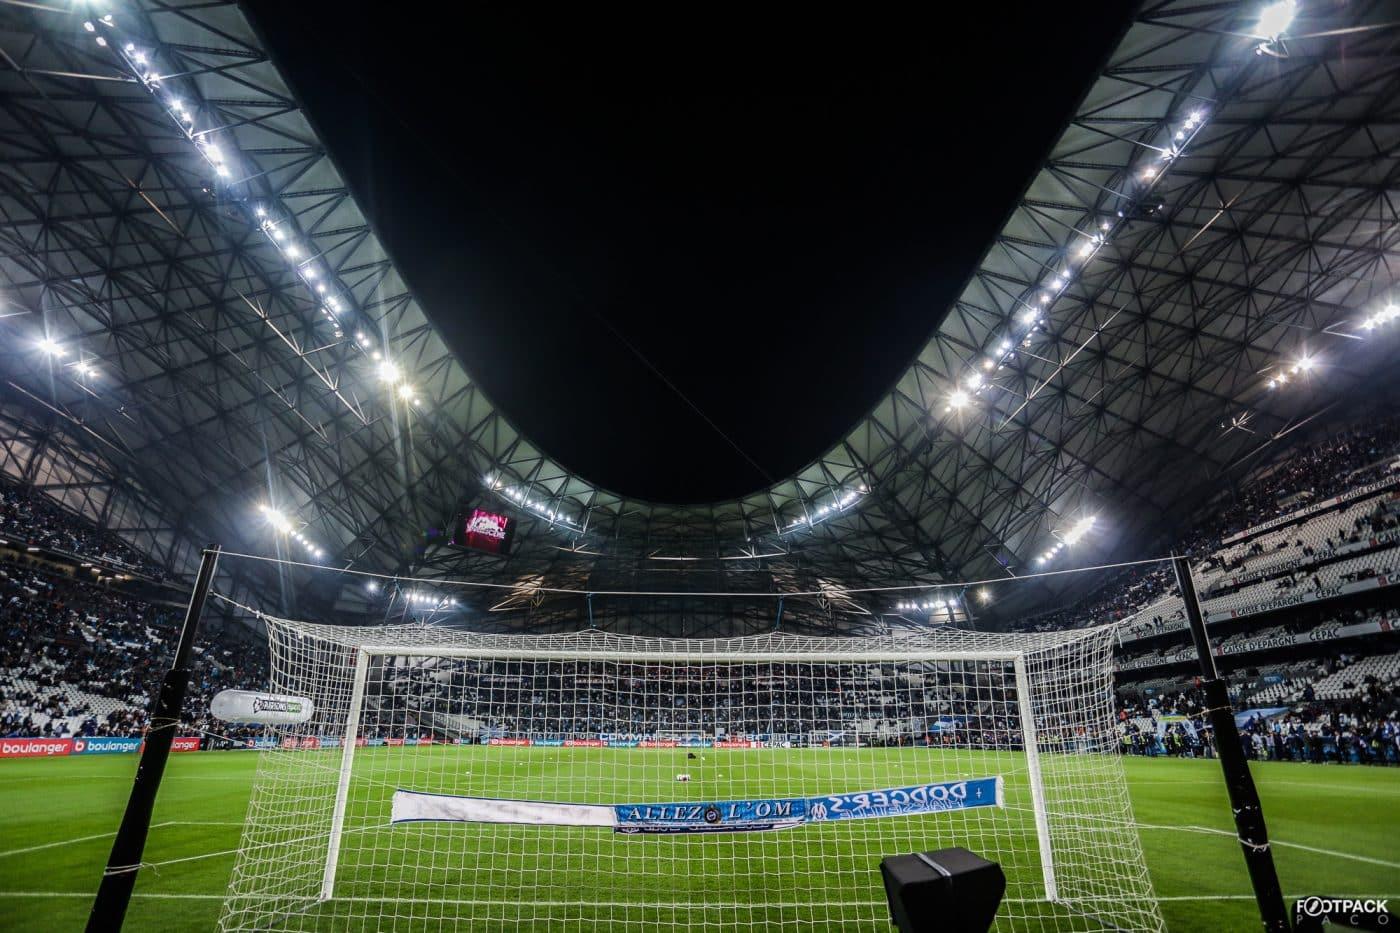 au-stade-marseille-paris-om-psg-footpack-1